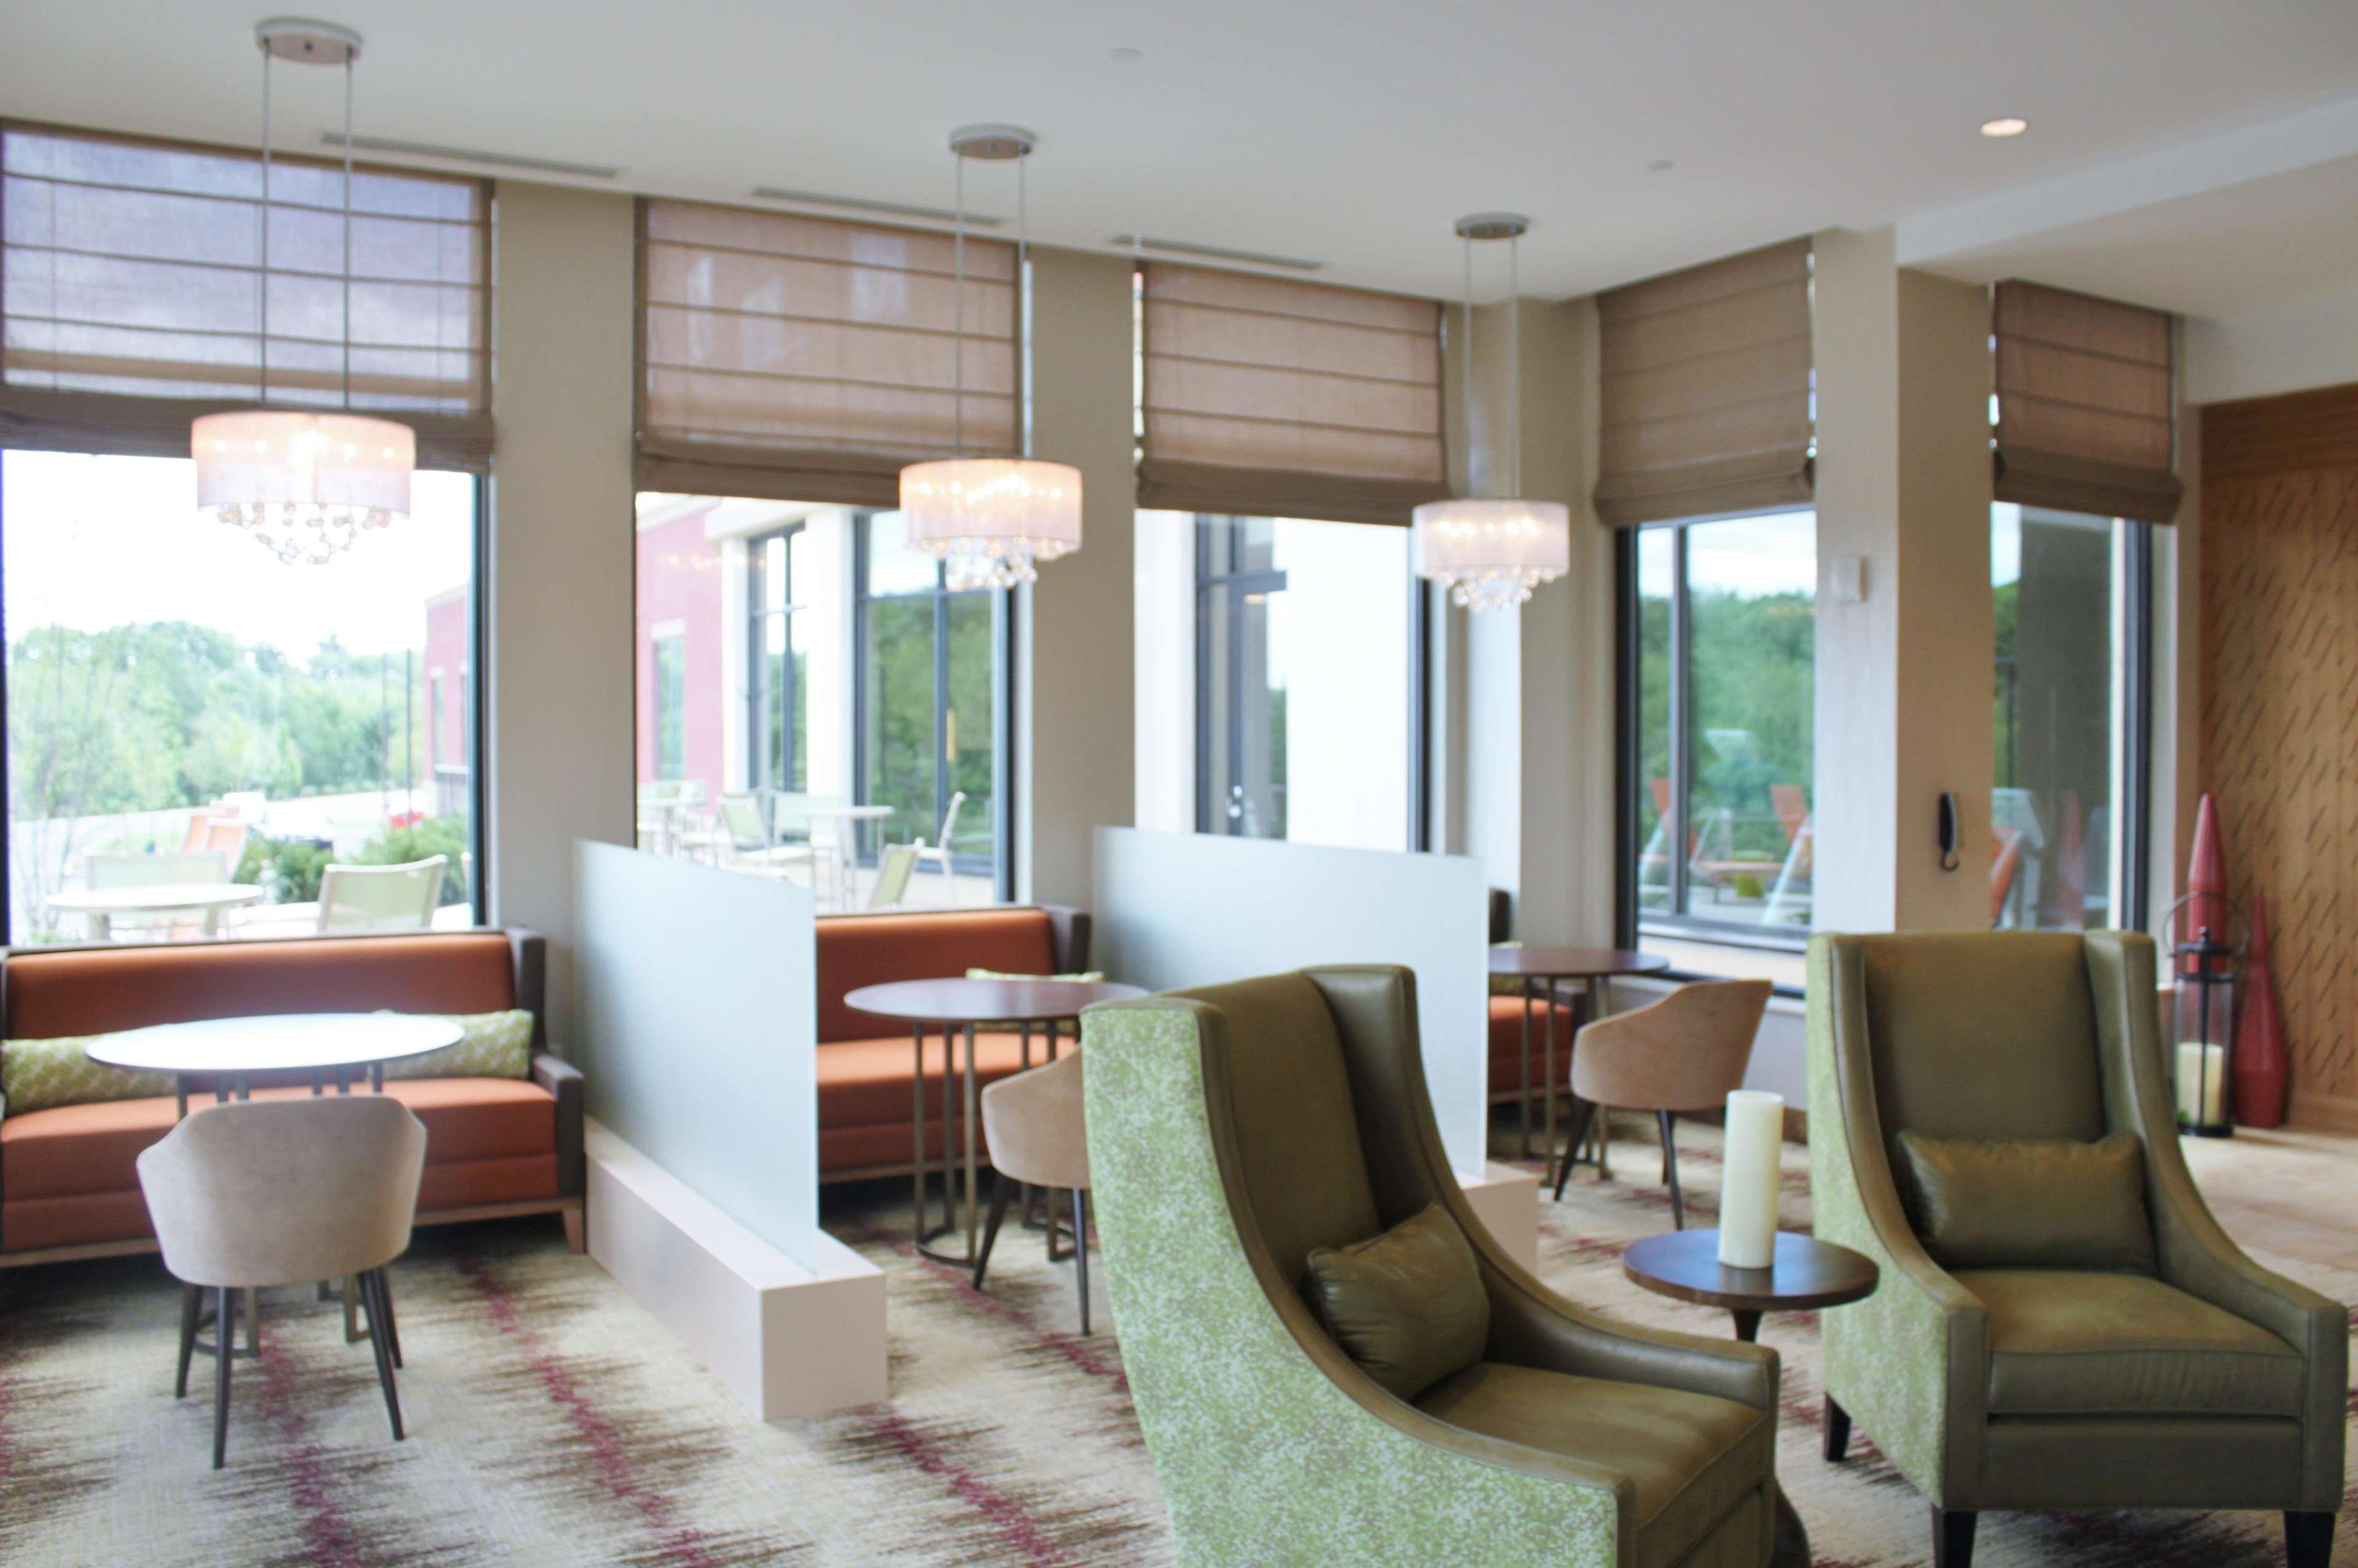 Hilton Garden Inn Boston/Marlborough image 29